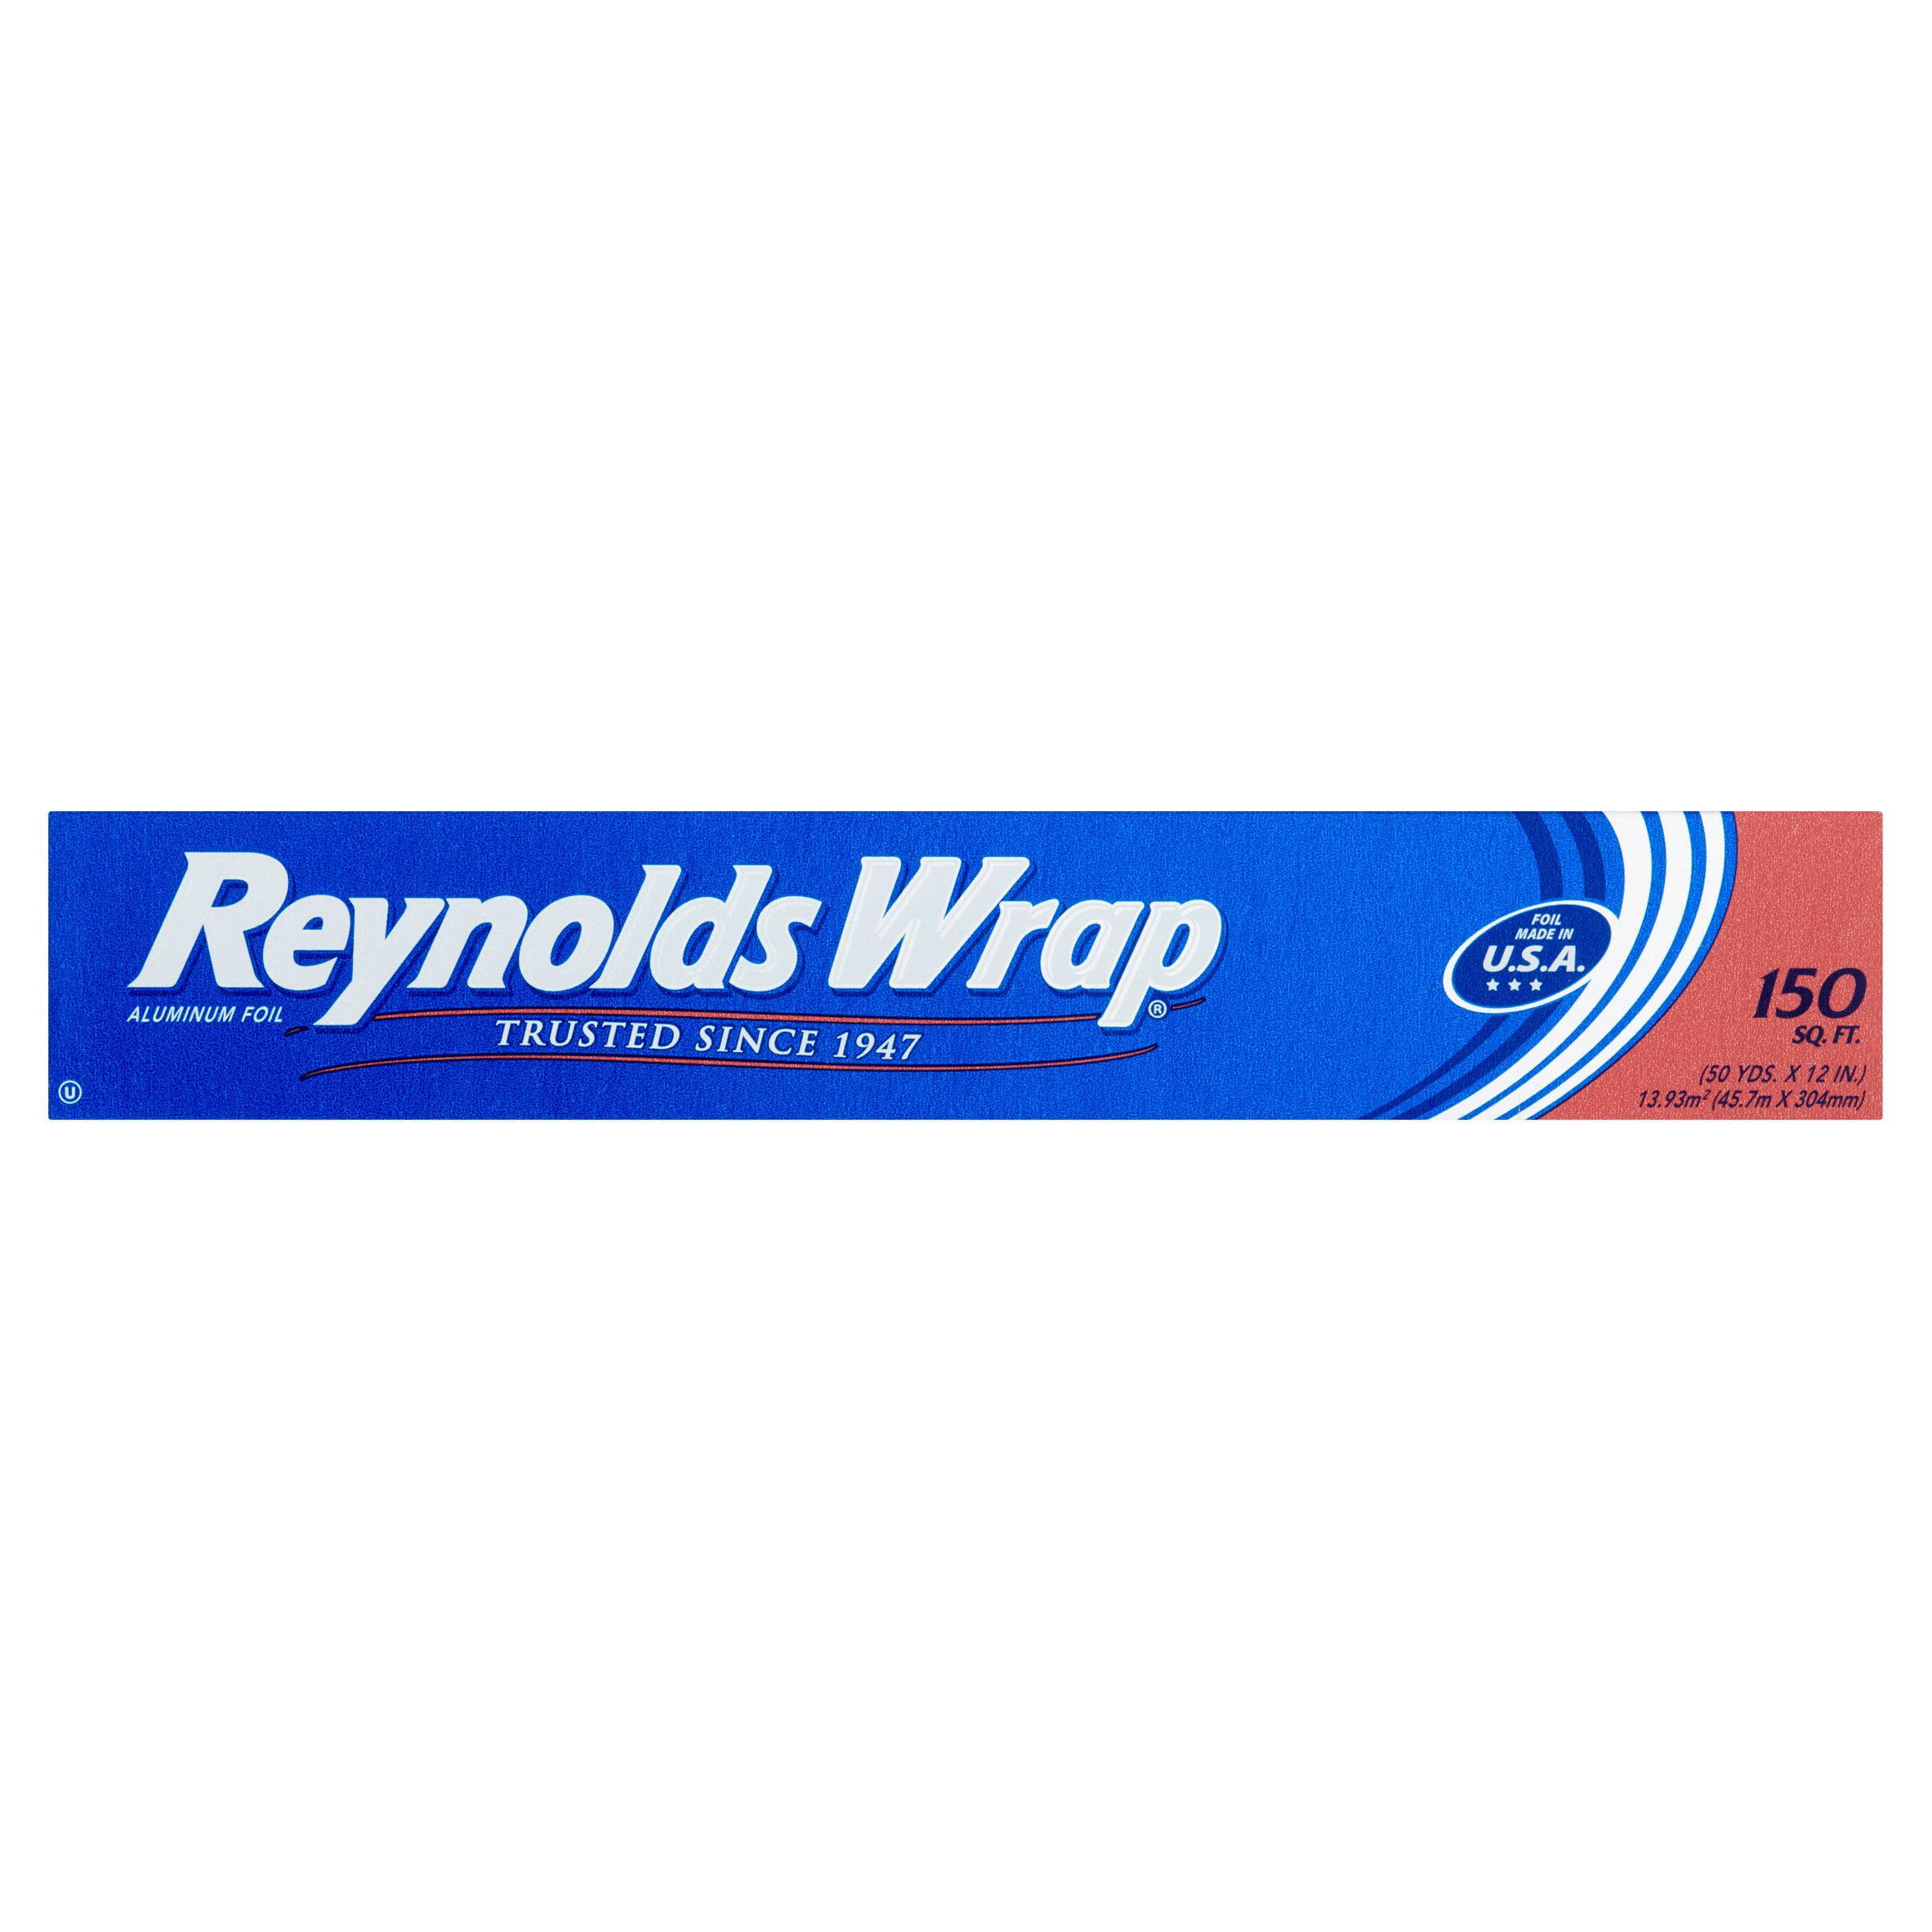 Reynolds Wrap Aluminum Foil (150 Square Foot Roll)